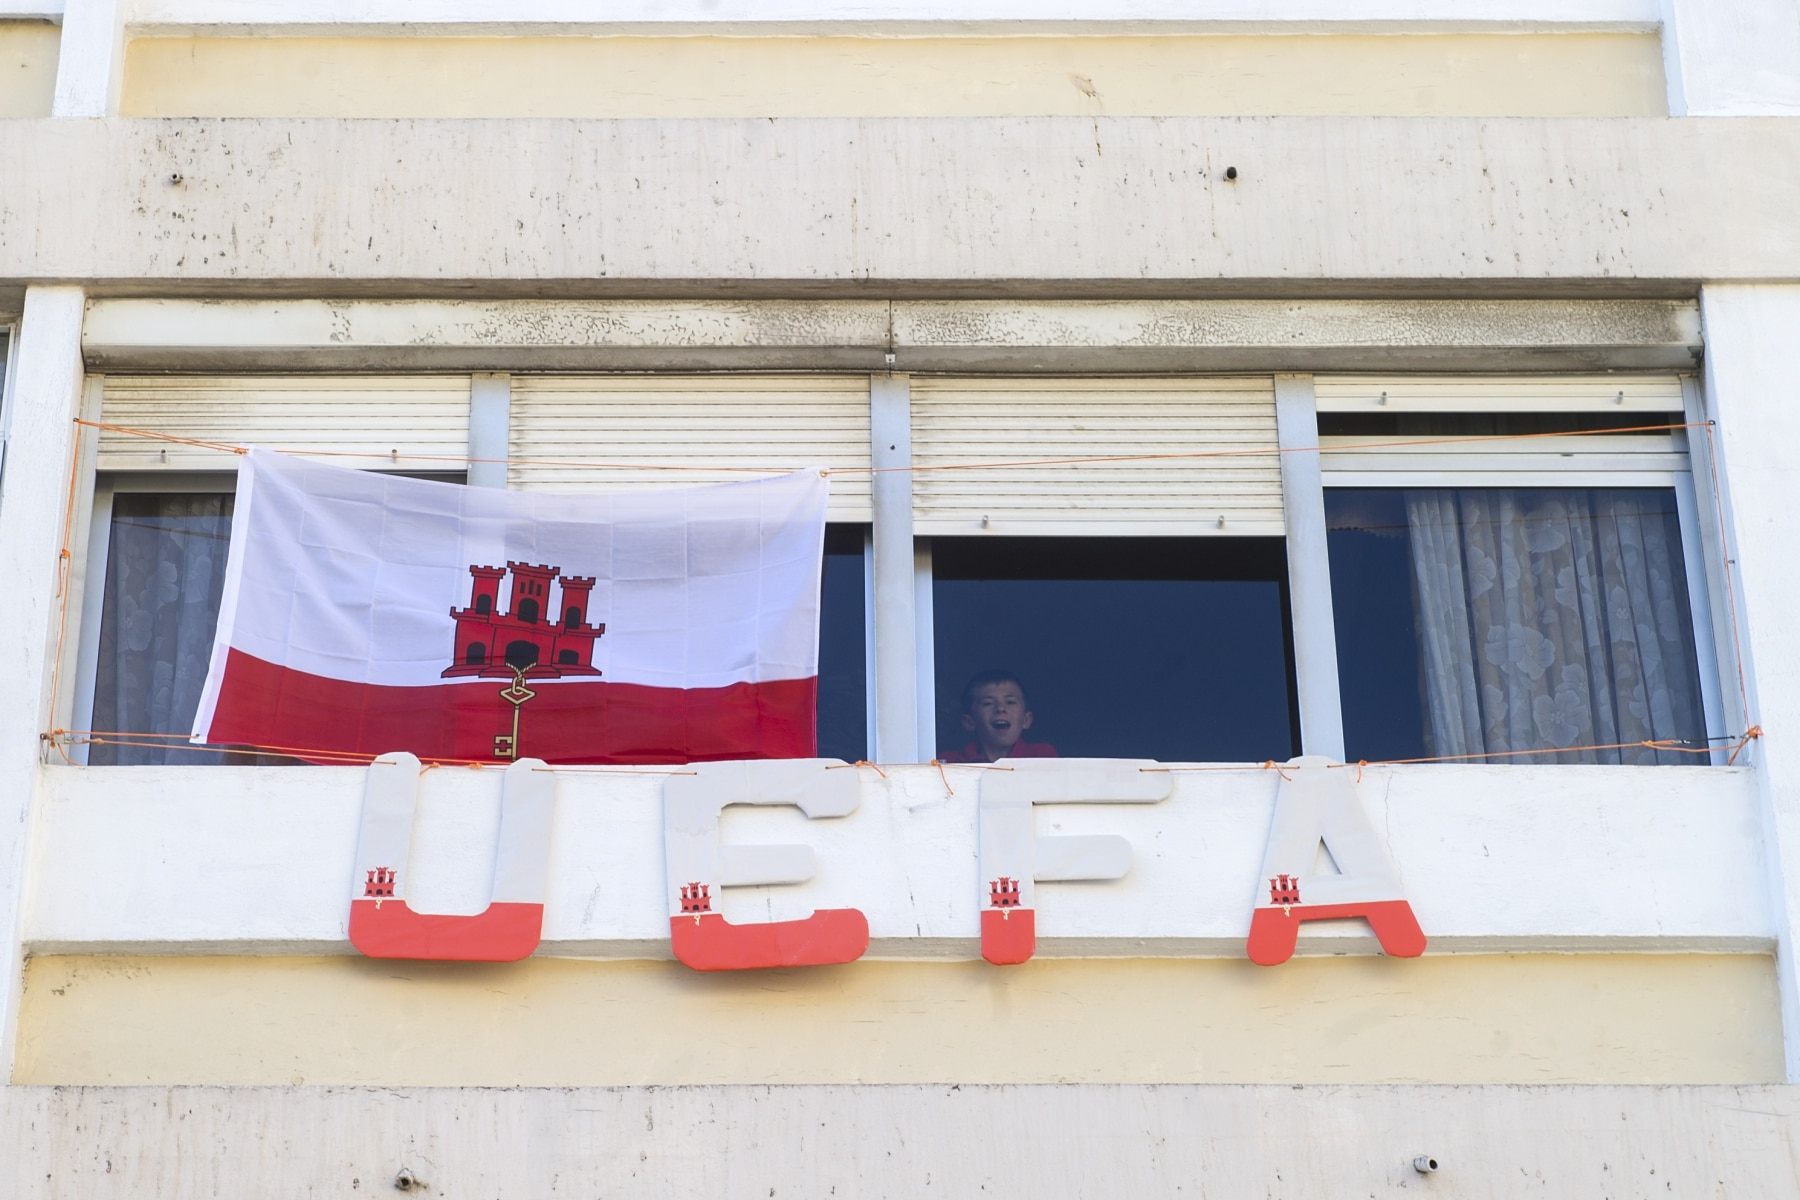 celebracin-entrada-gibraltar-en-la-uefa-17_9222044379_o